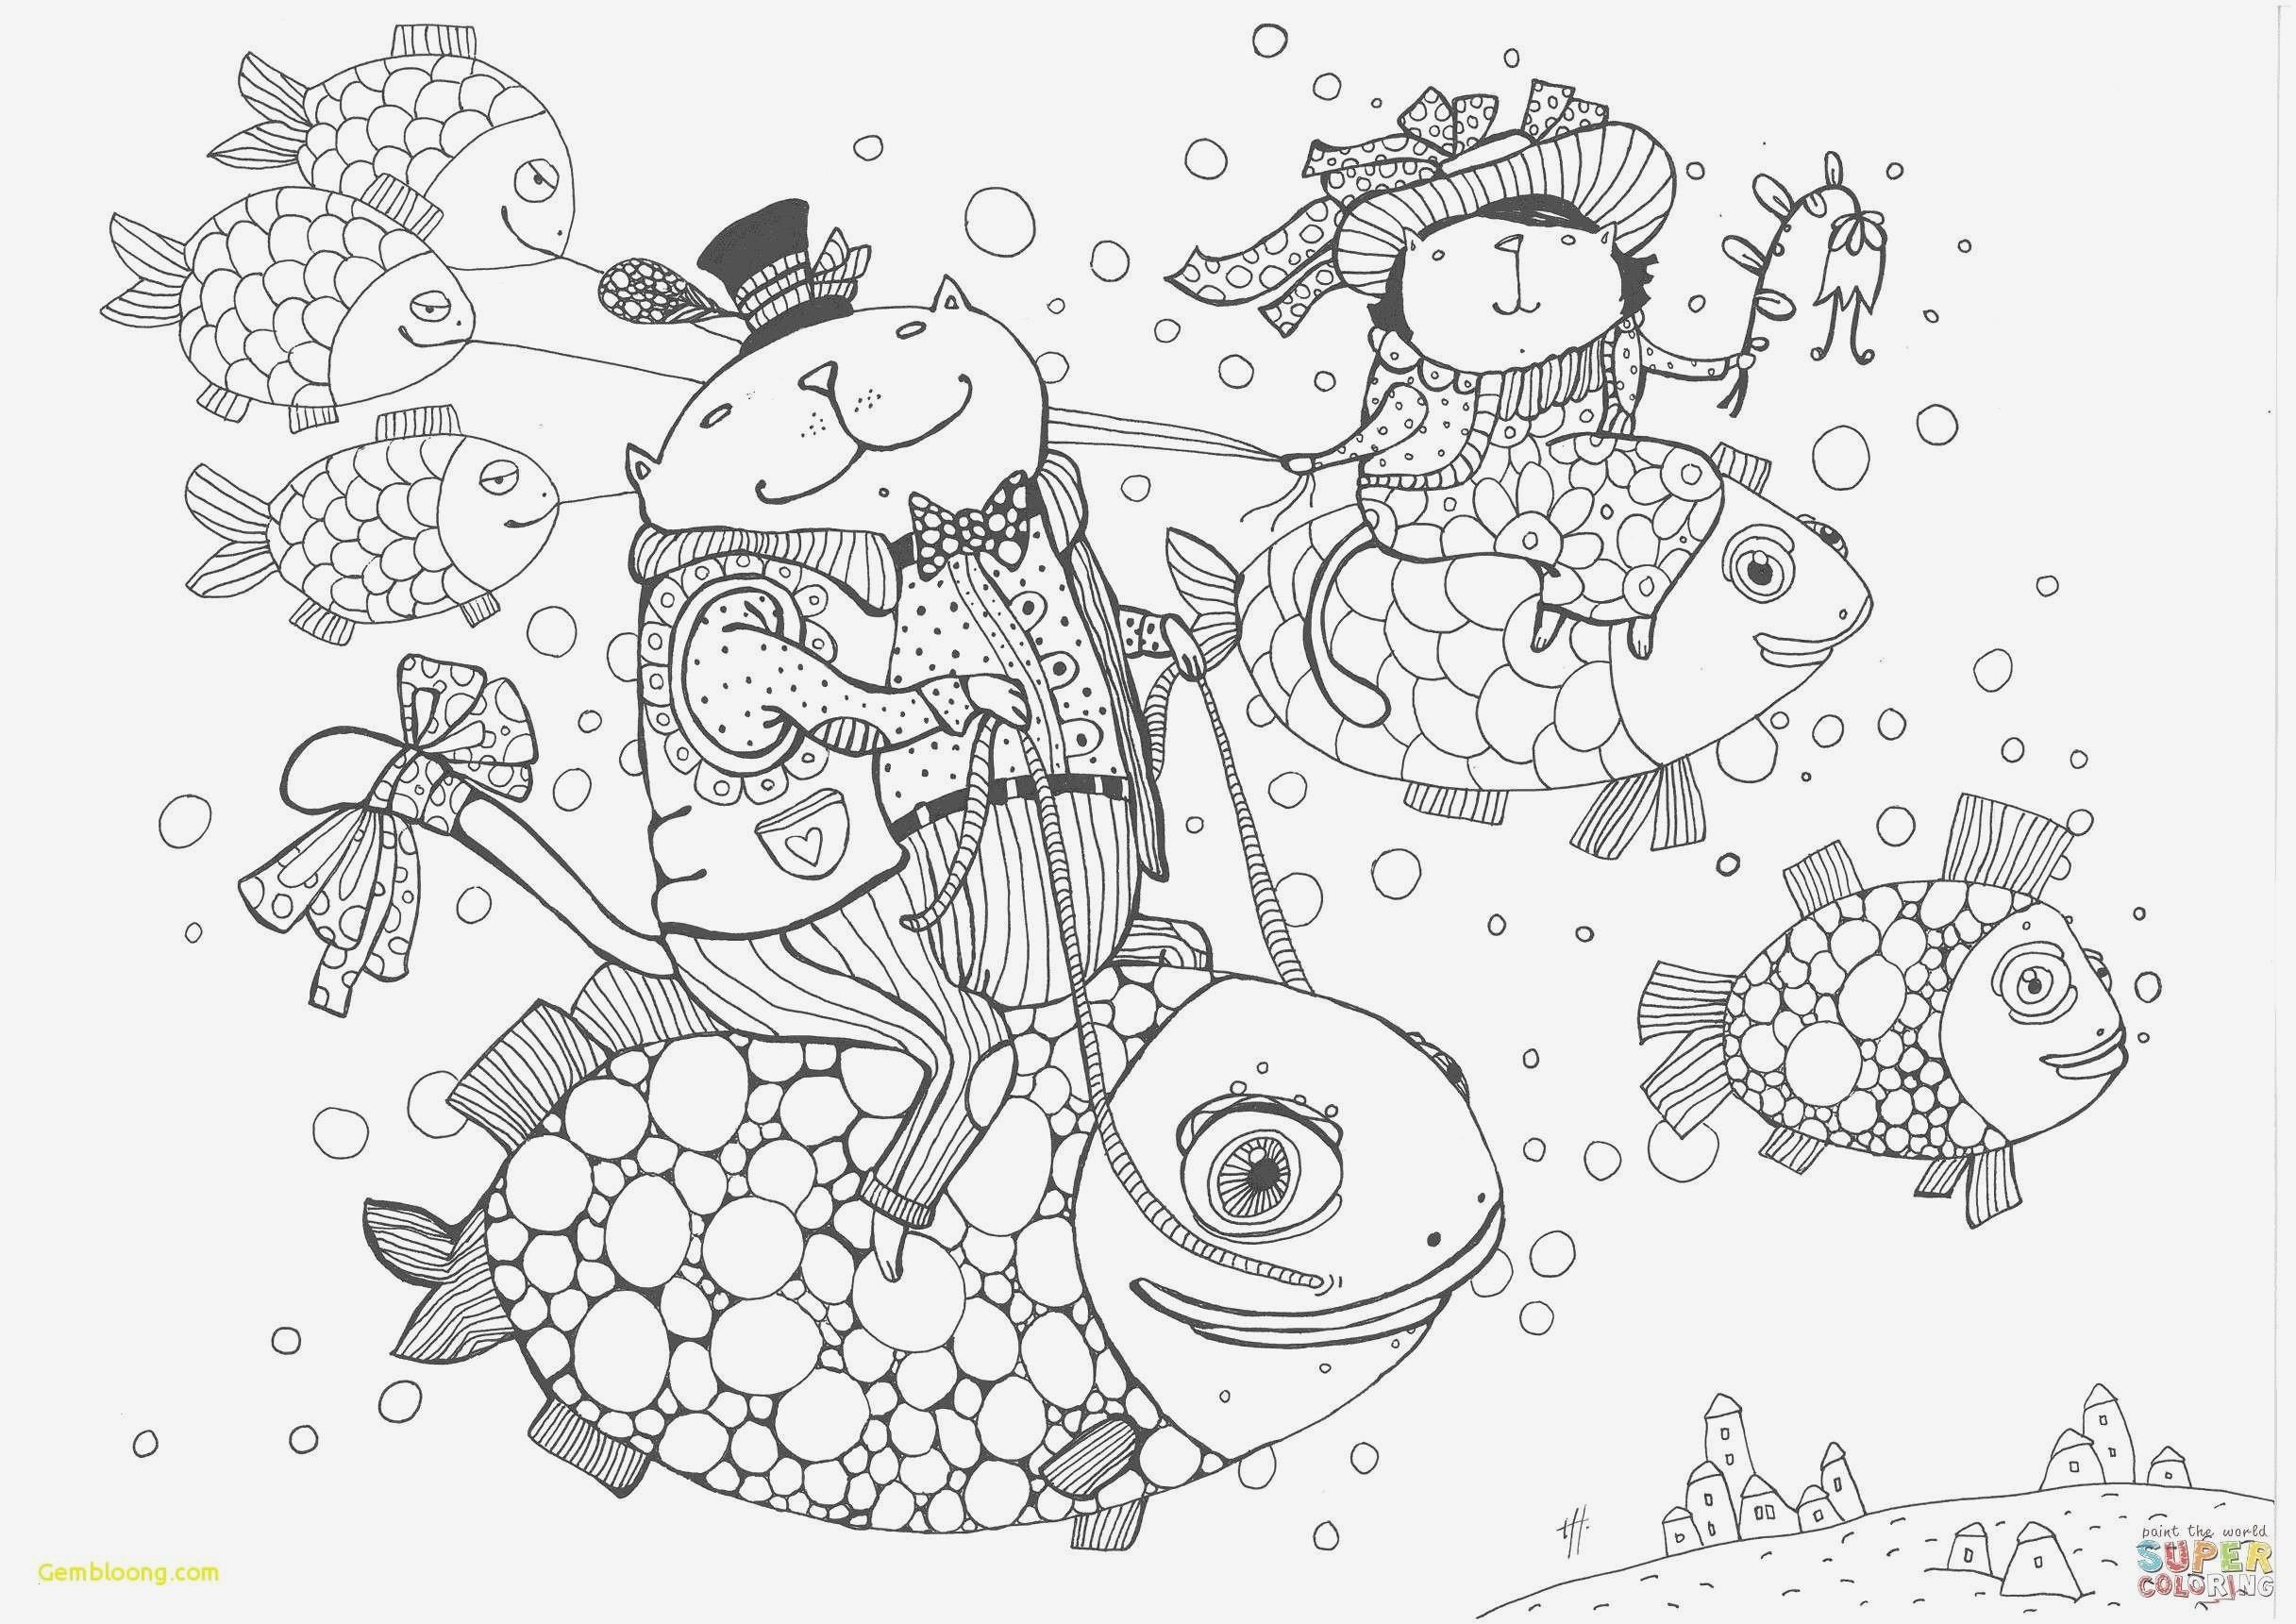 Ausmalbild Ninjago Drache Neu Ninjago Malvorlagen Kostenlos Zum Ausdrucken Spannende Coloring Galerie